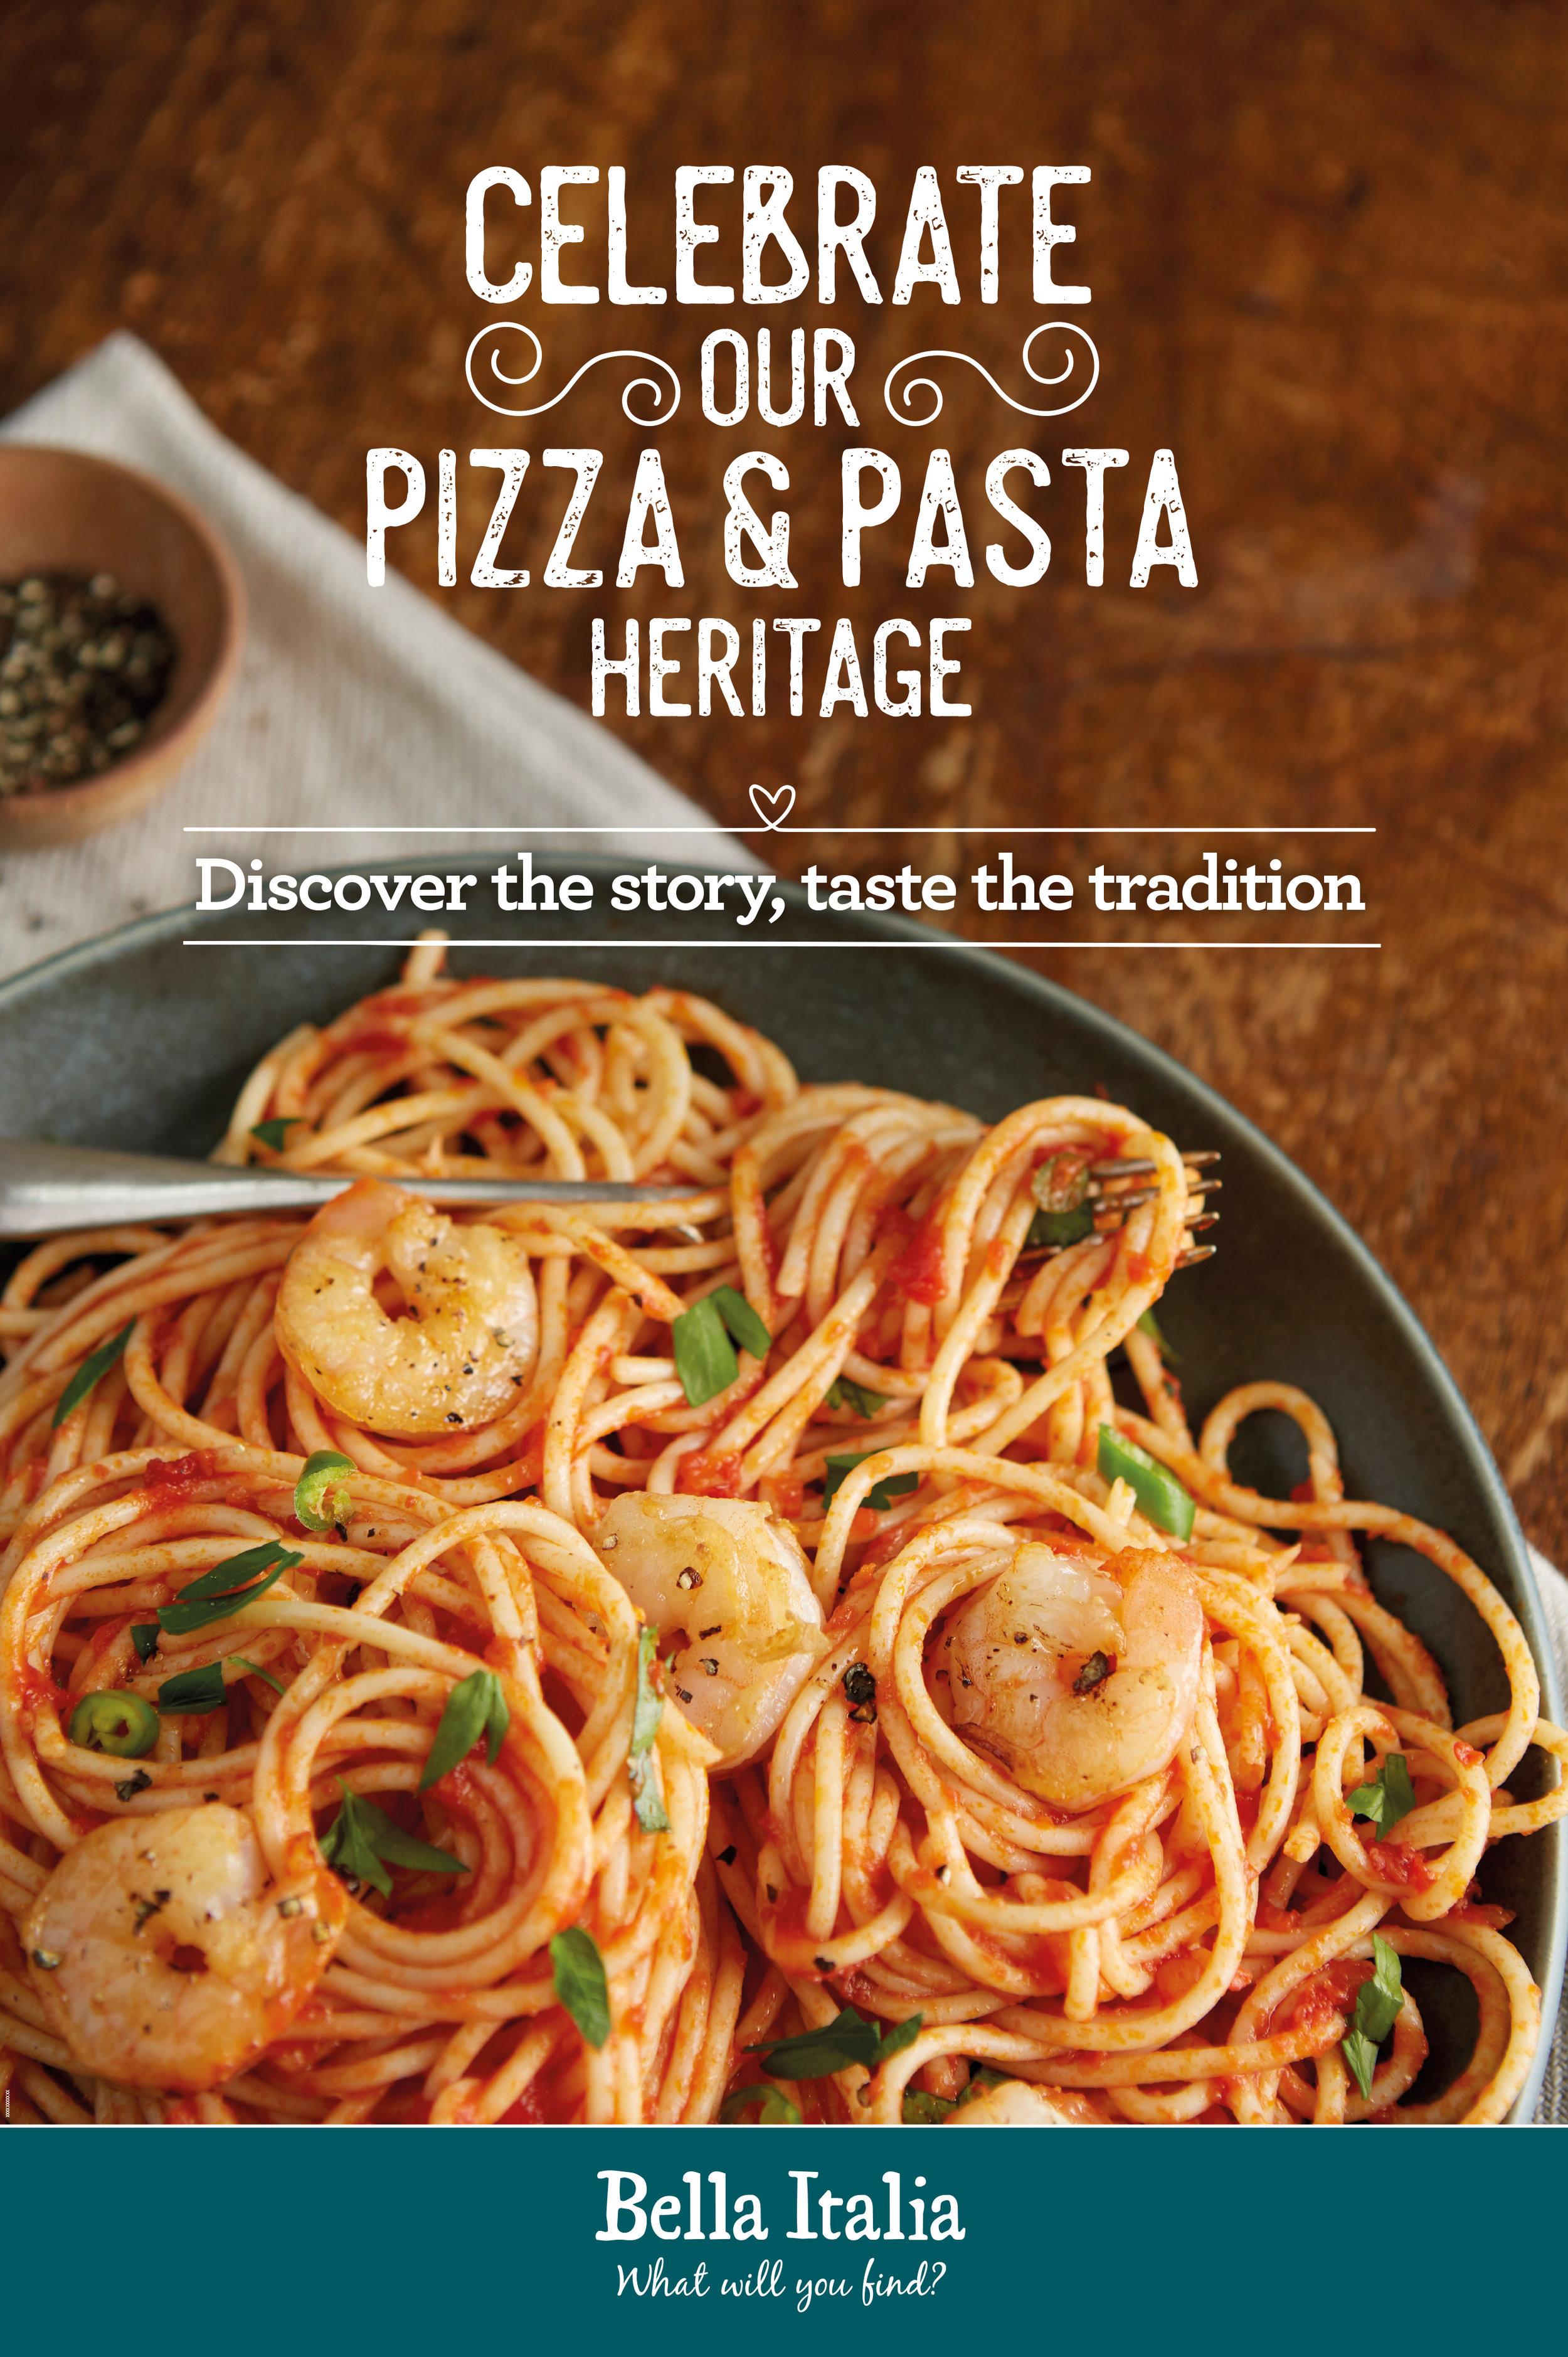 447979-Bella-Italia_Pizza-Pasta-Carnival-AB_Large-1220x812mm.jpg